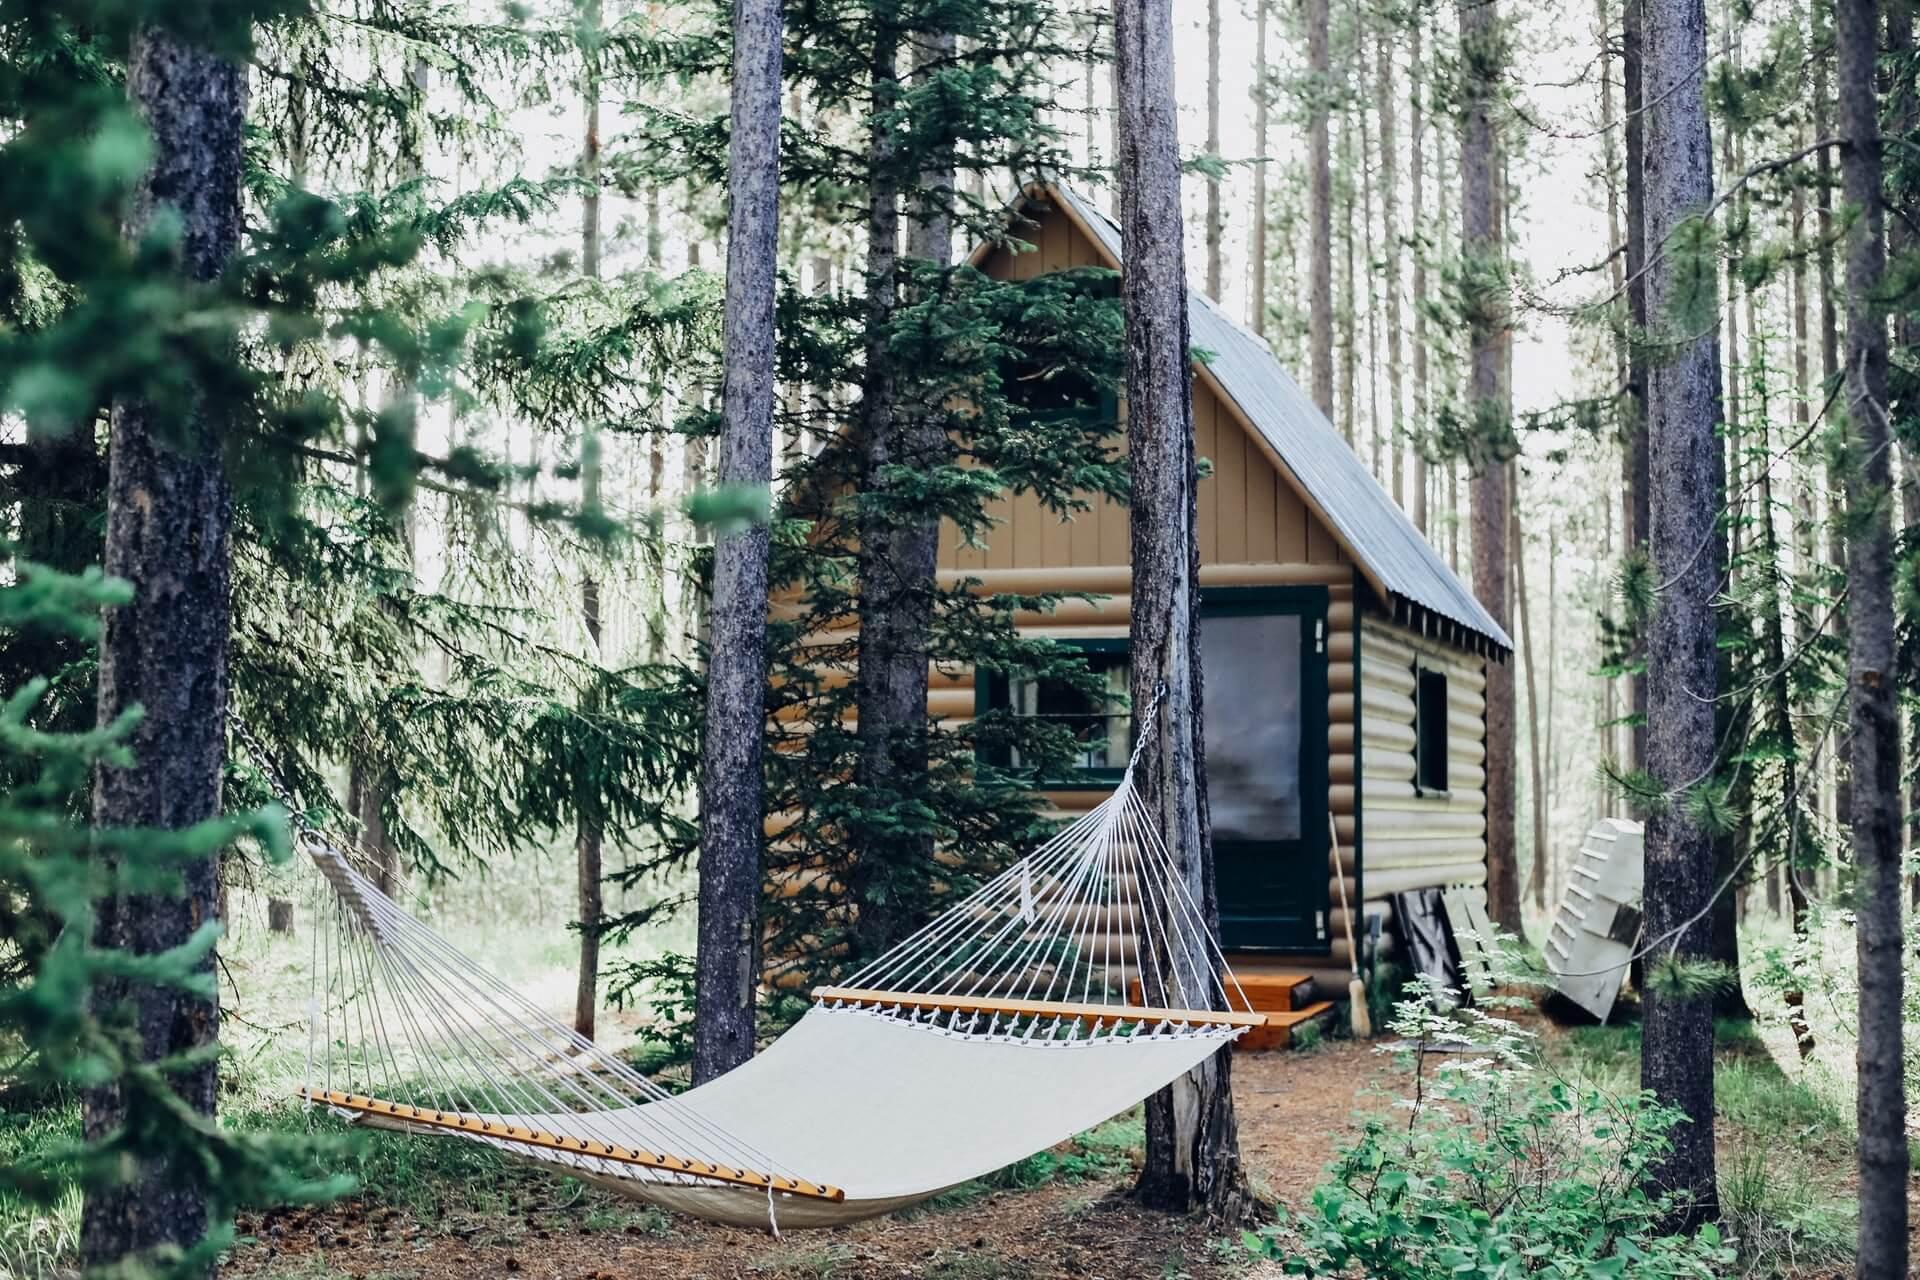 Honeymoon Cabins in Sevierville, TN